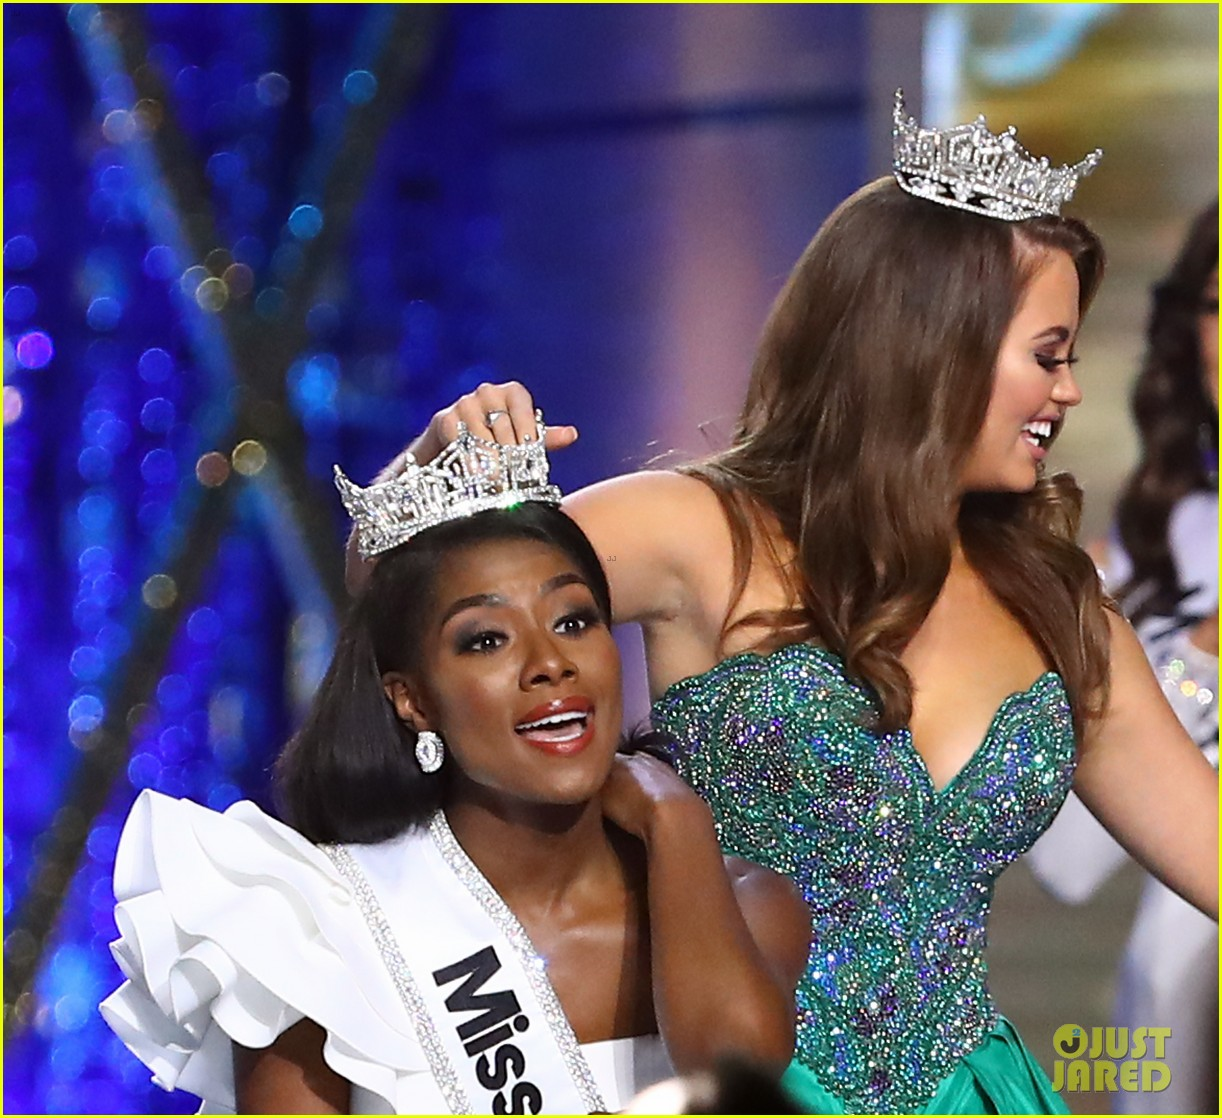 nia imani franklin, miss america 2019. Miss-america-2019-new-york-nia-imani-franklin-11